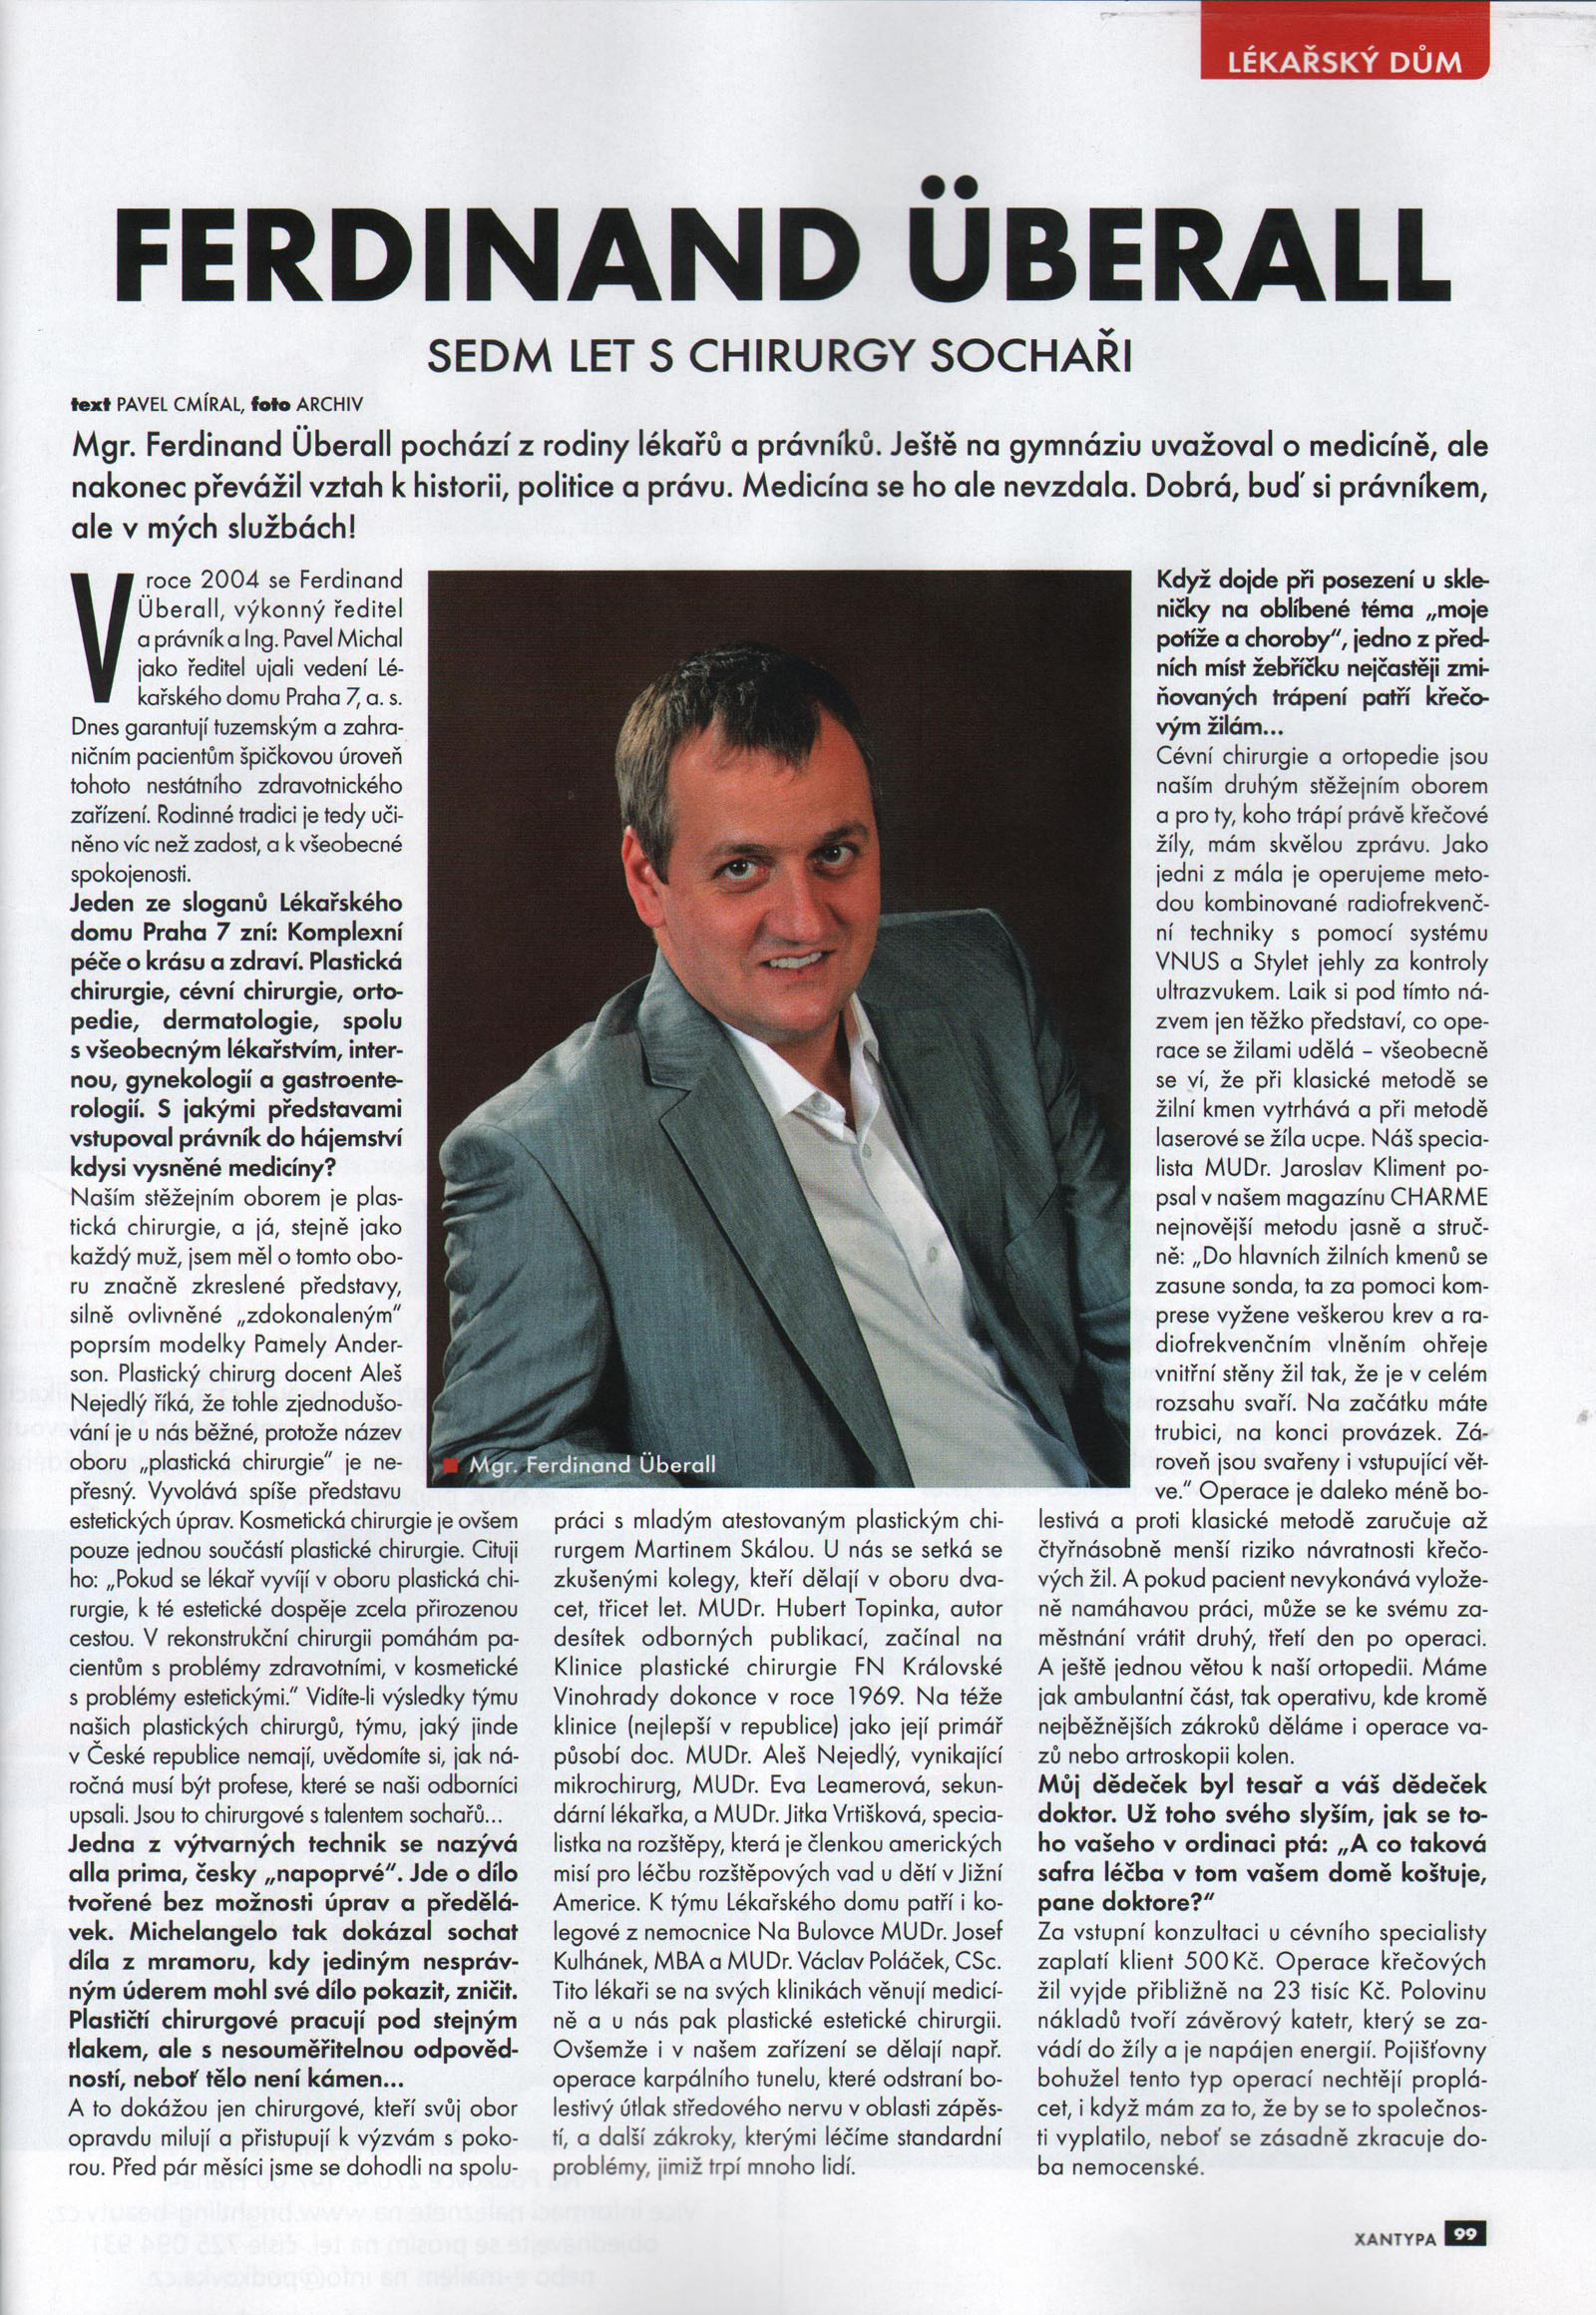 Xantypa březen 2012 článek str. 99 1